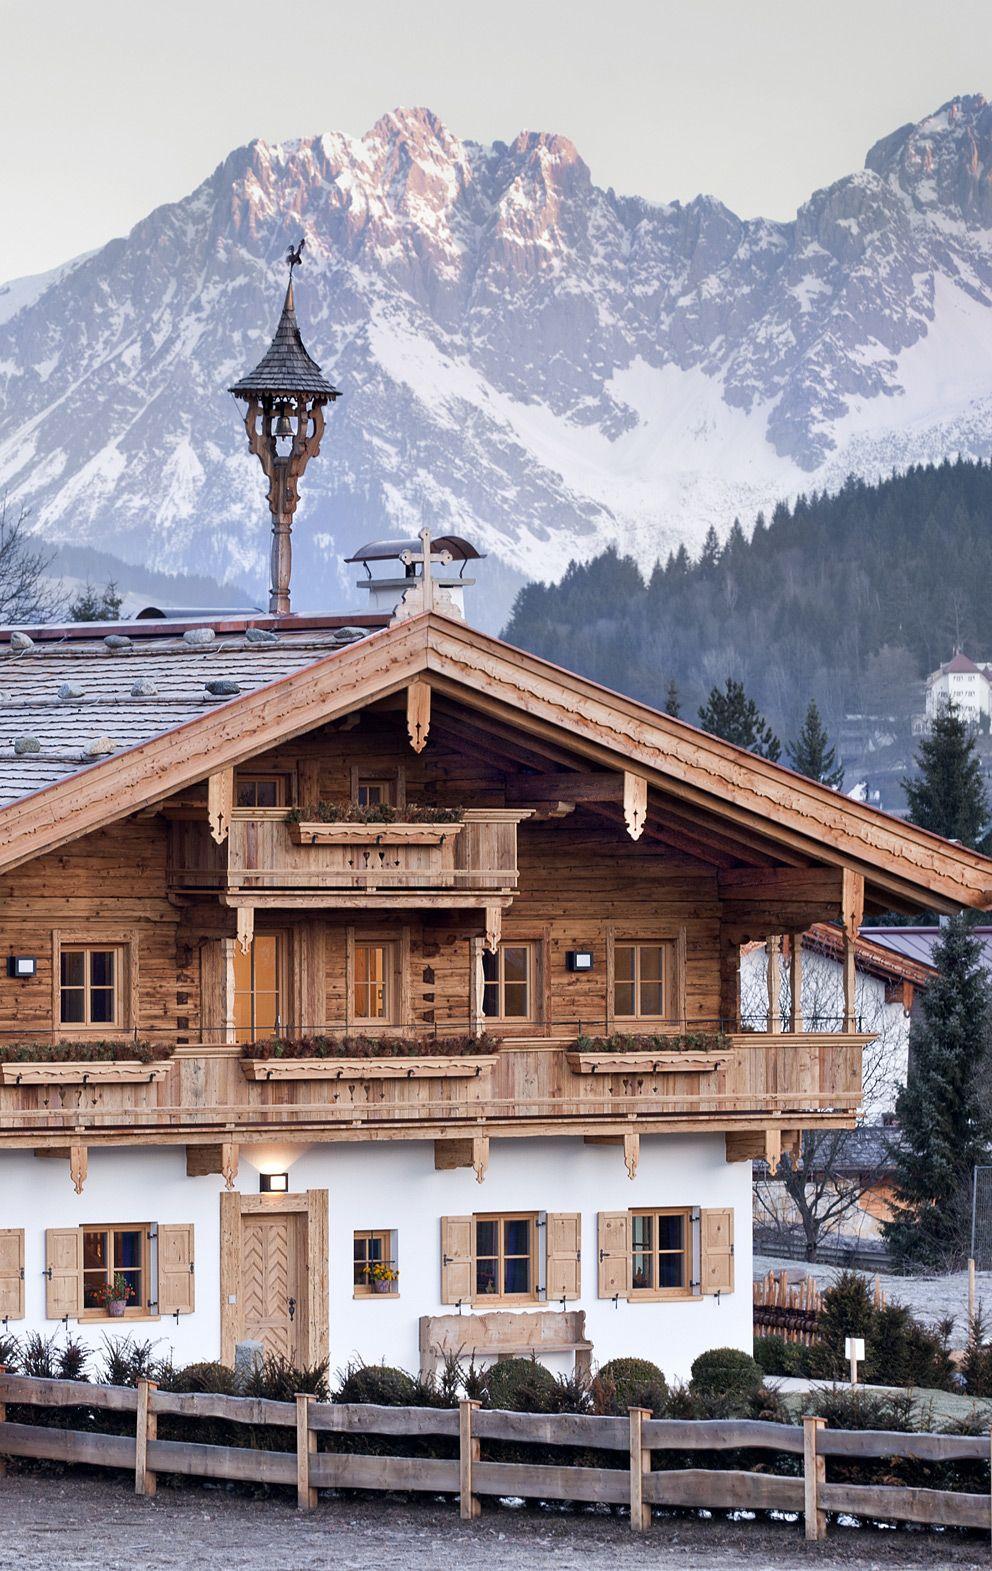 Chalet Angerpoid, near Kitzbühel, Austria